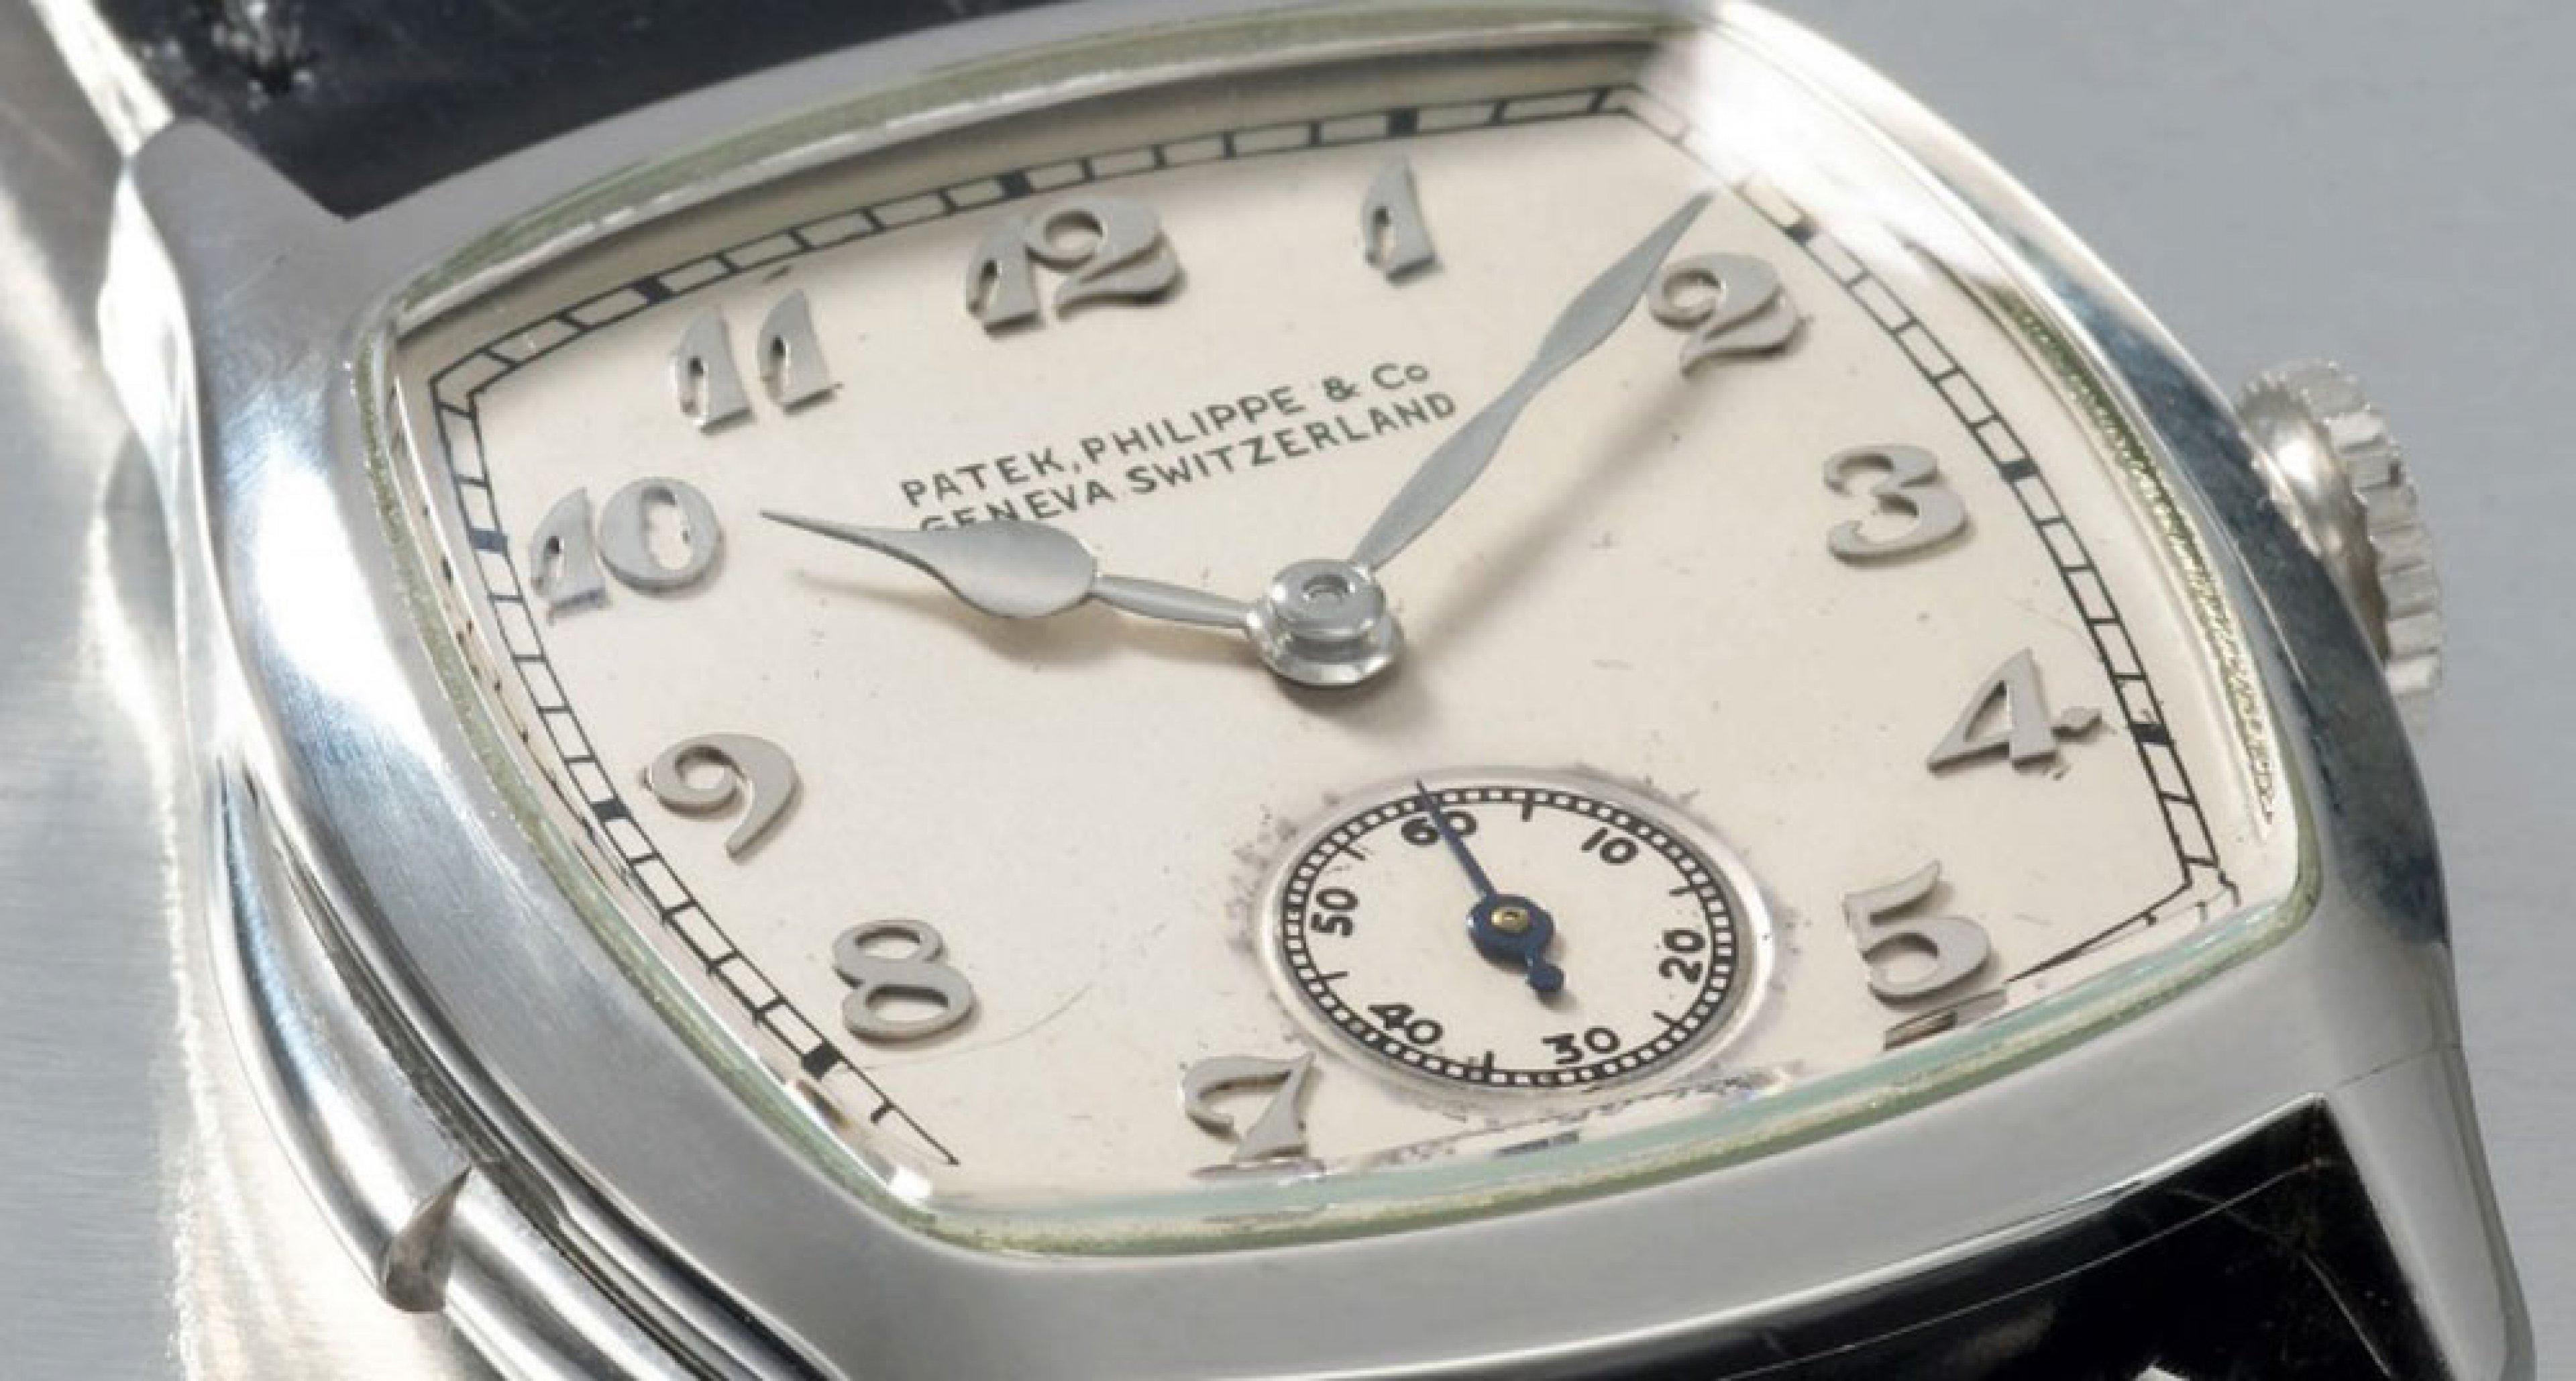 Lot 101 the Patek complication watch for Henry Graves jr.